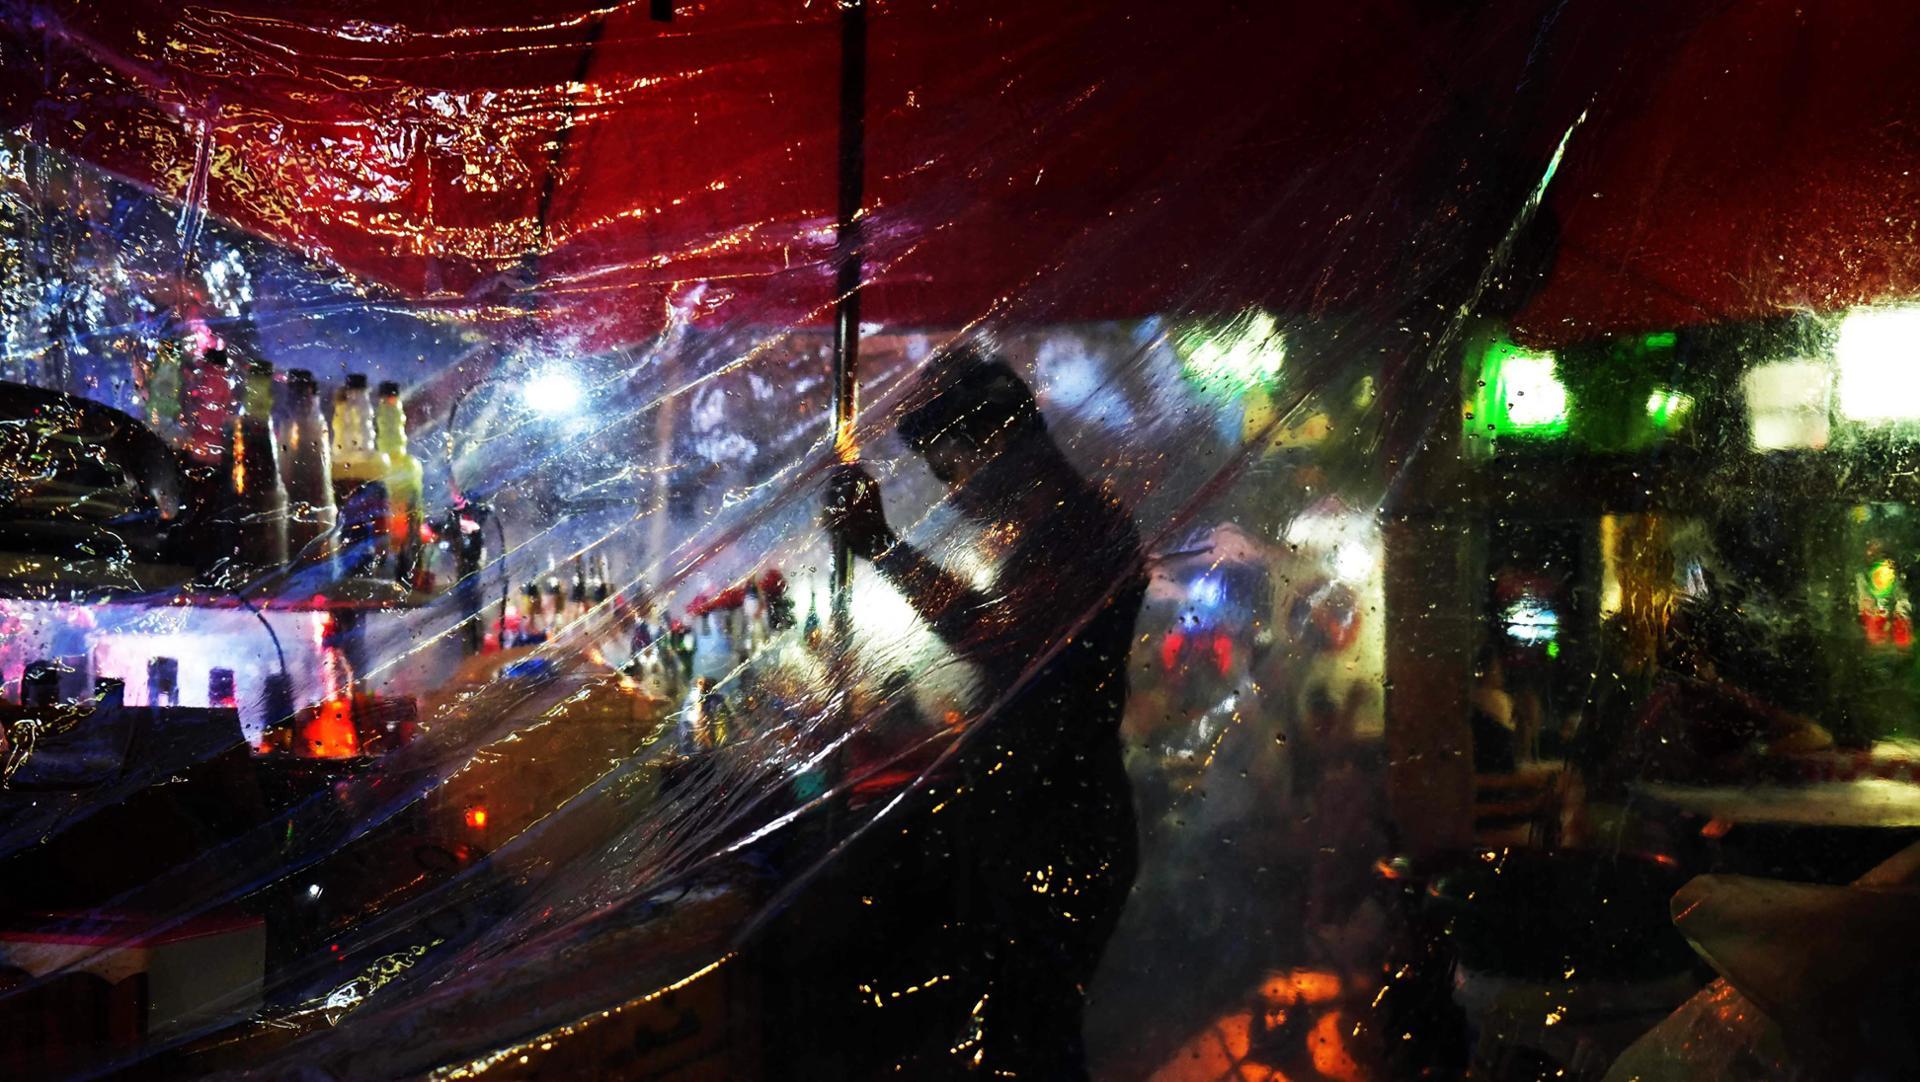 One rainy night in Bangkok